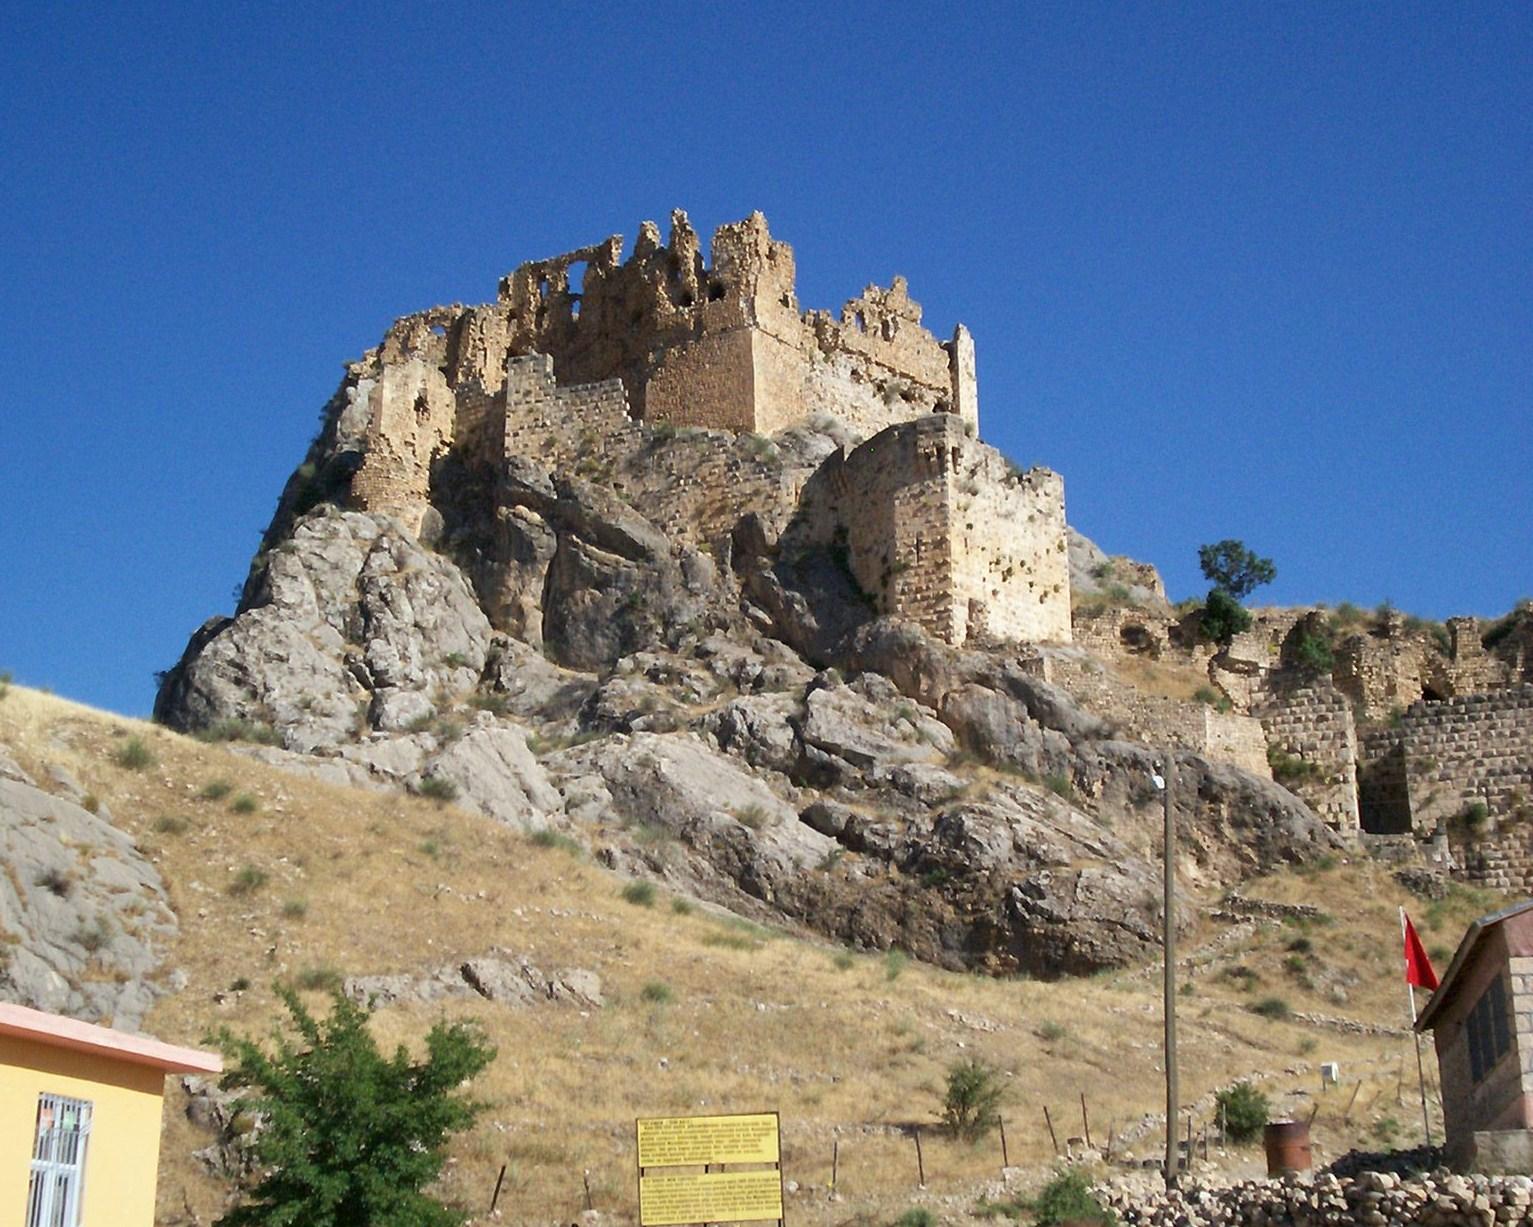 File:Kahta-castle.jpg - Wikimedia Commons